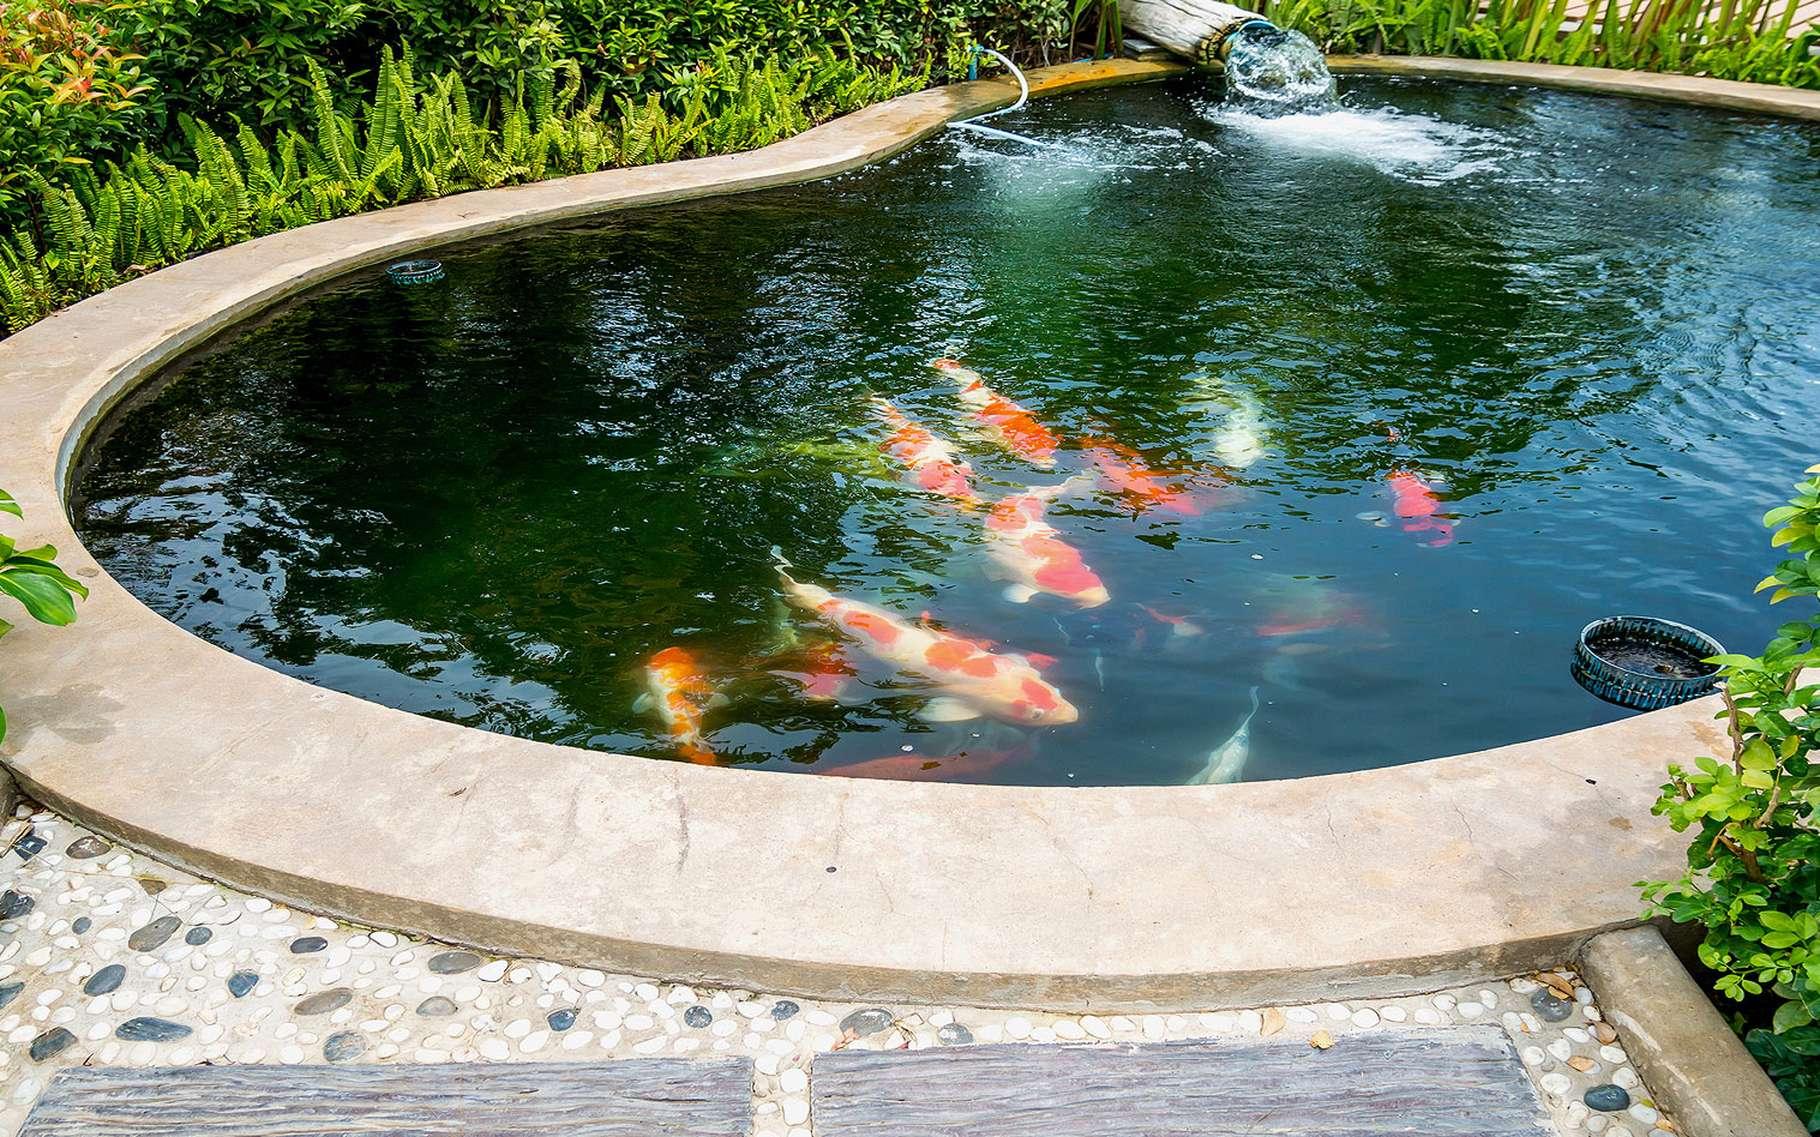 Construire Son Bassin De Jardin les bassins de jardin en béton | dossier